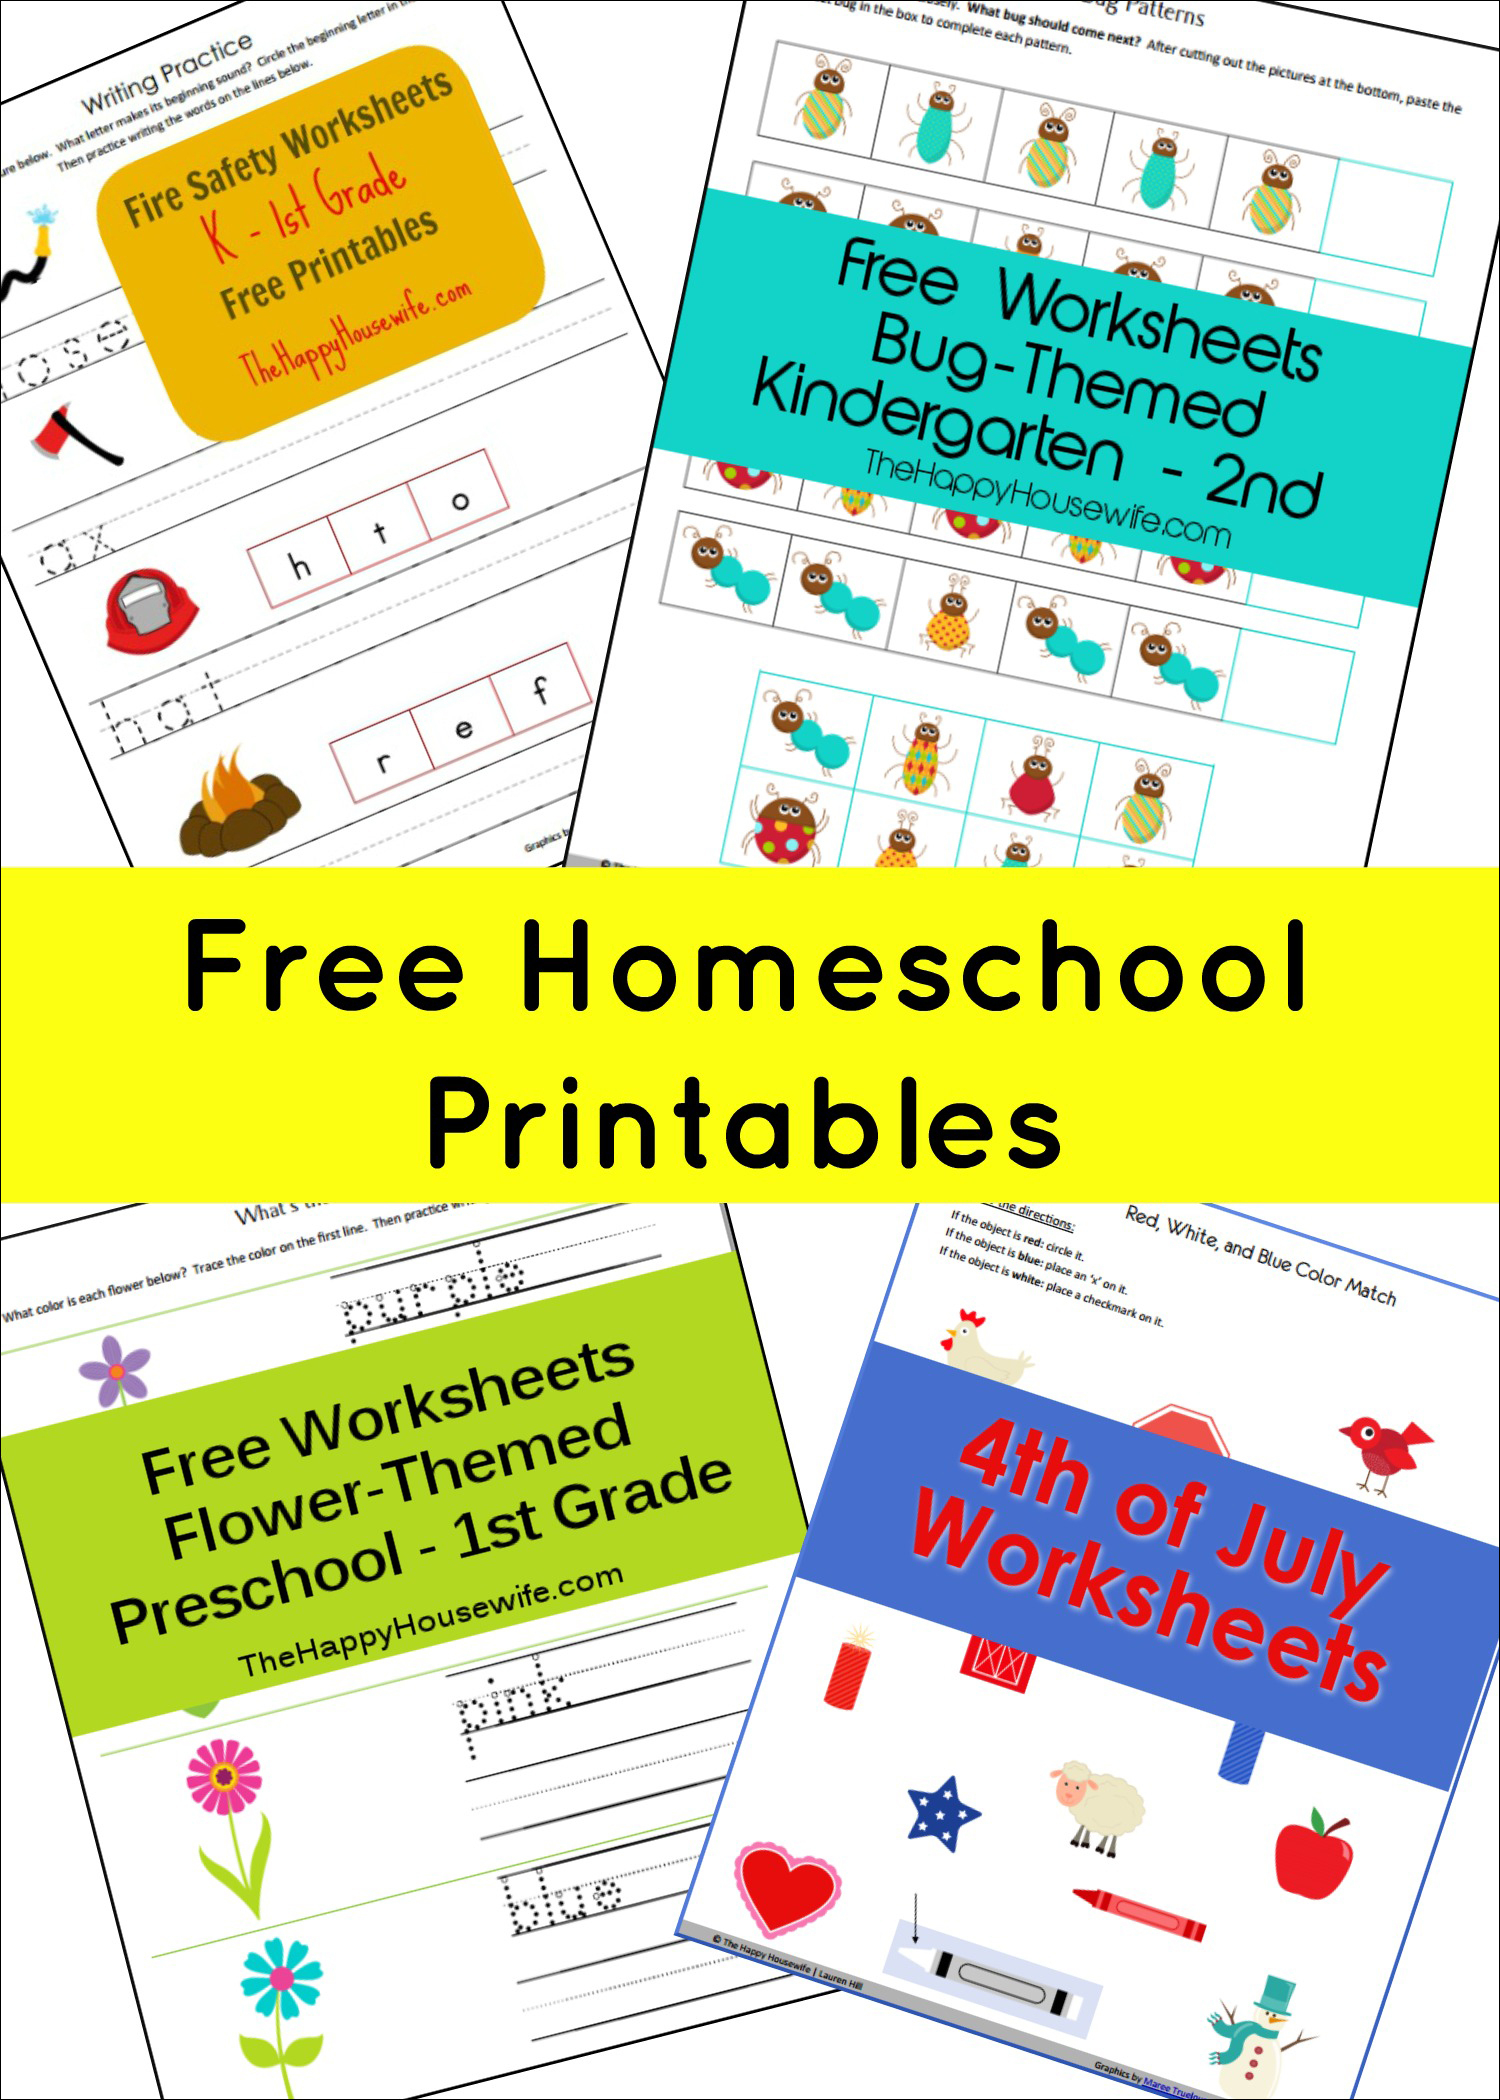 Four Seasons Worksheets: Free Printables - The Happy Housewife - Free Printable Seasons Worksheets For Kindergarten